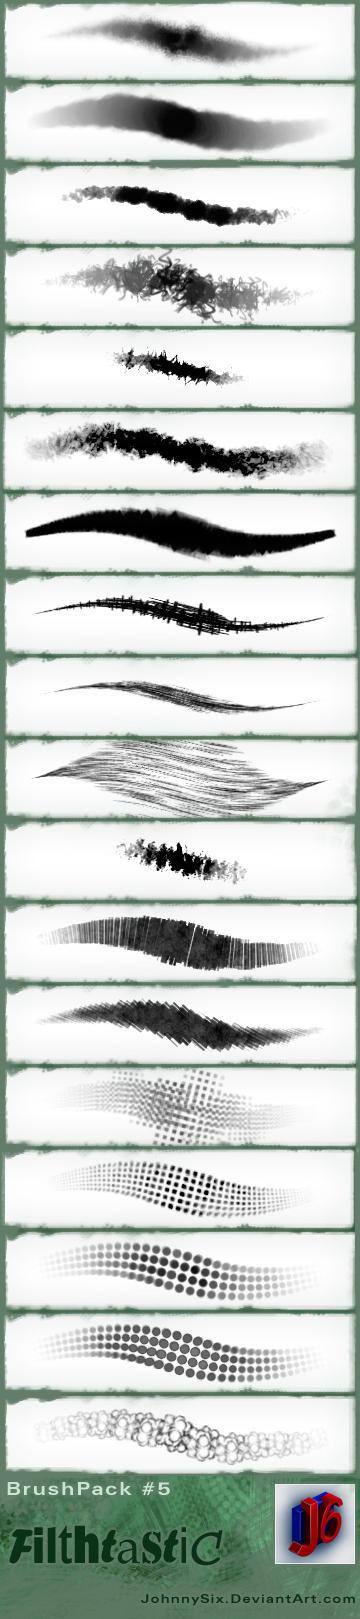 Filthtastic brush Pack by JohnnySix